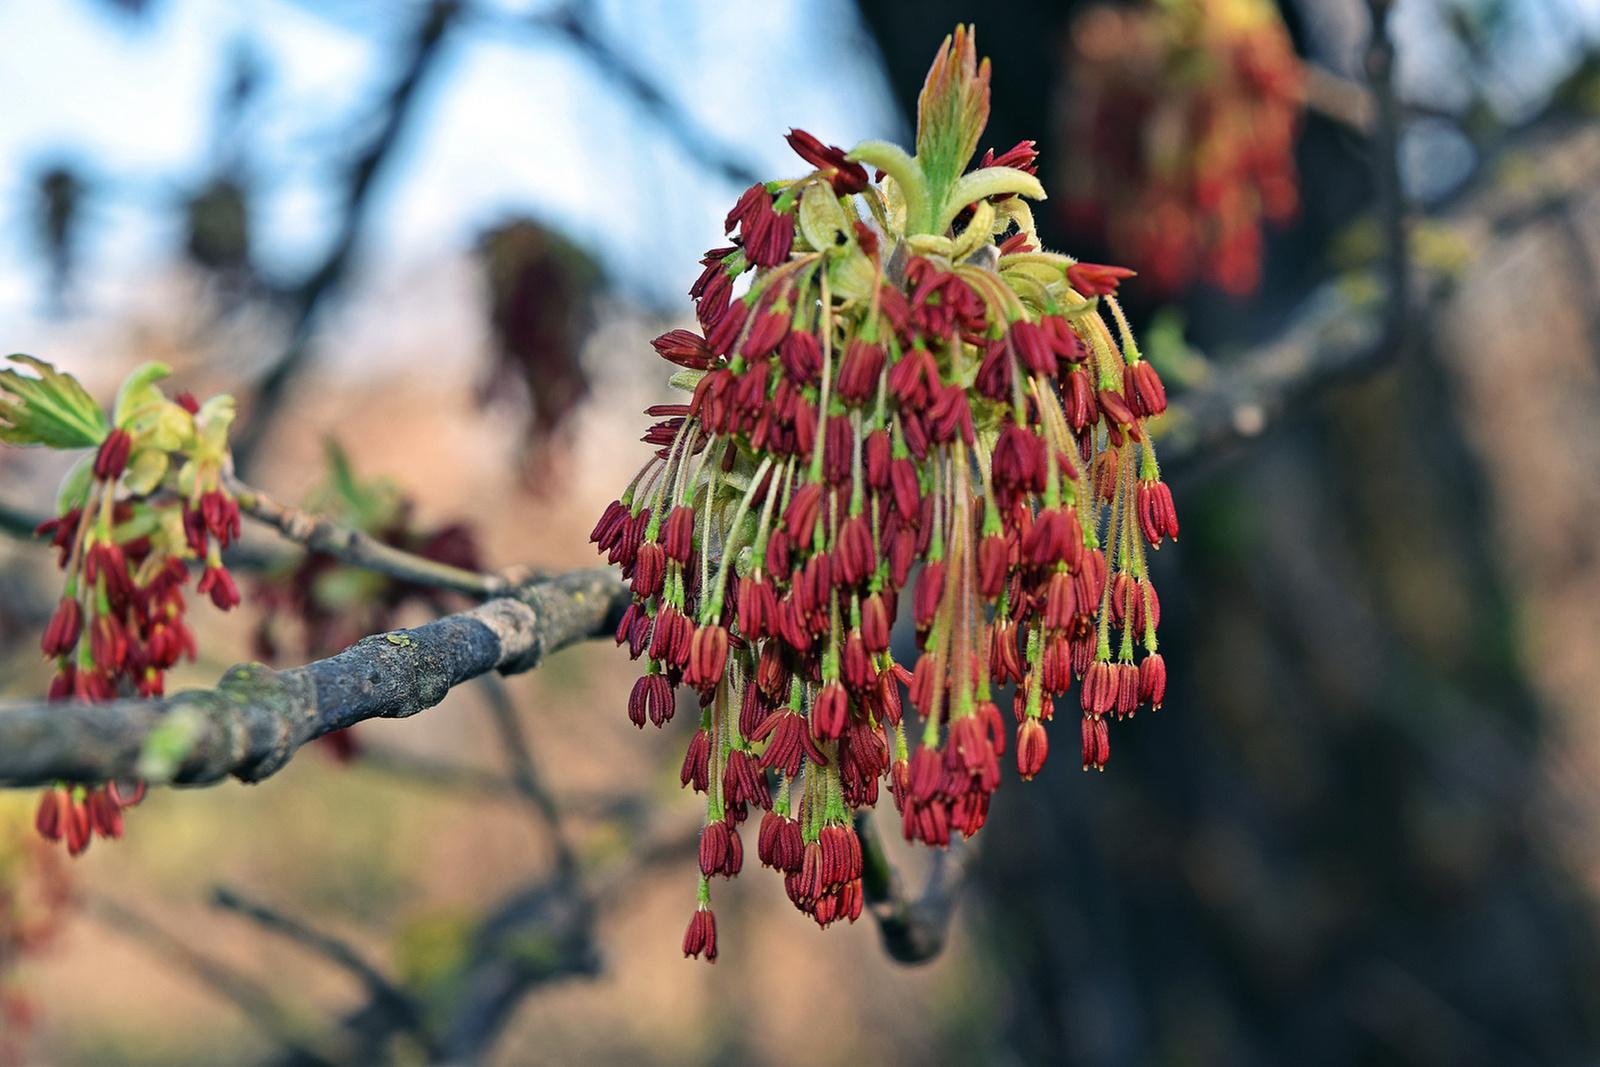 Kőrislevelű juhar virága